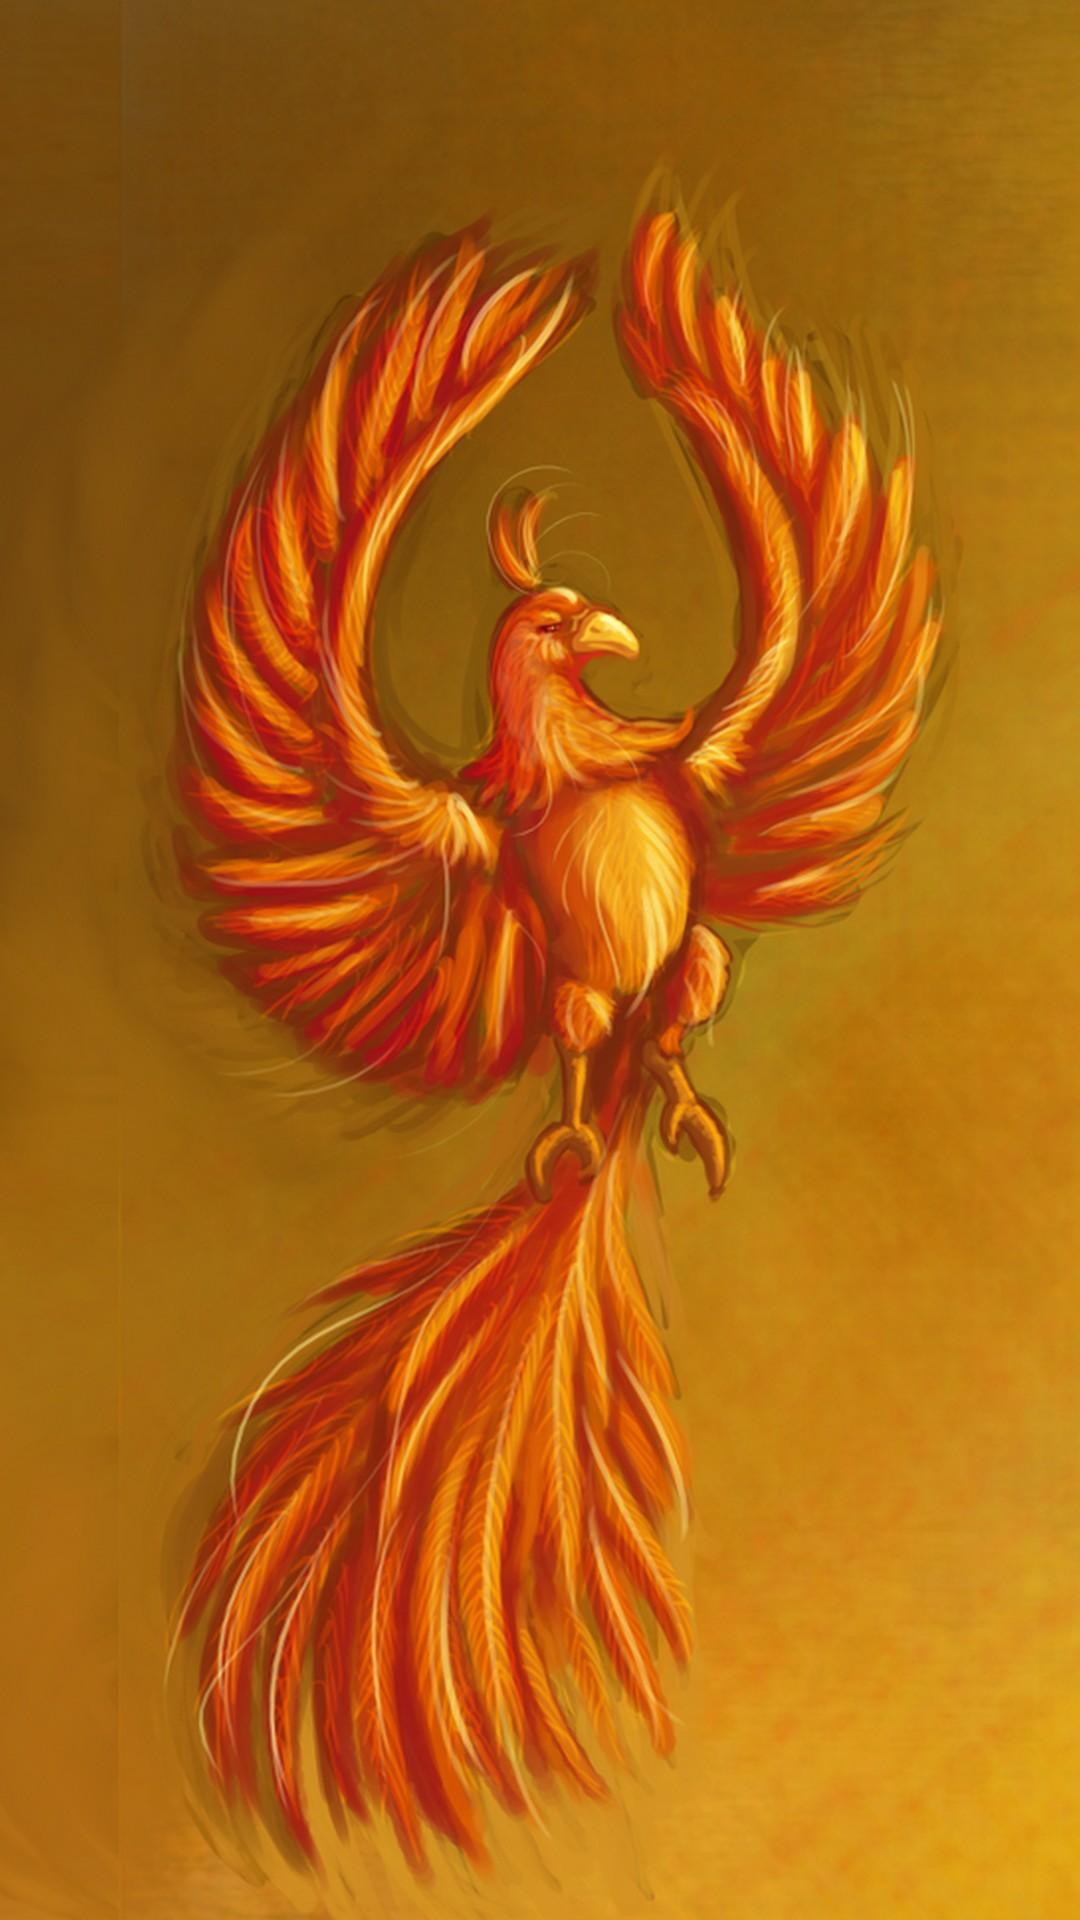 Golden Phoenix Bird